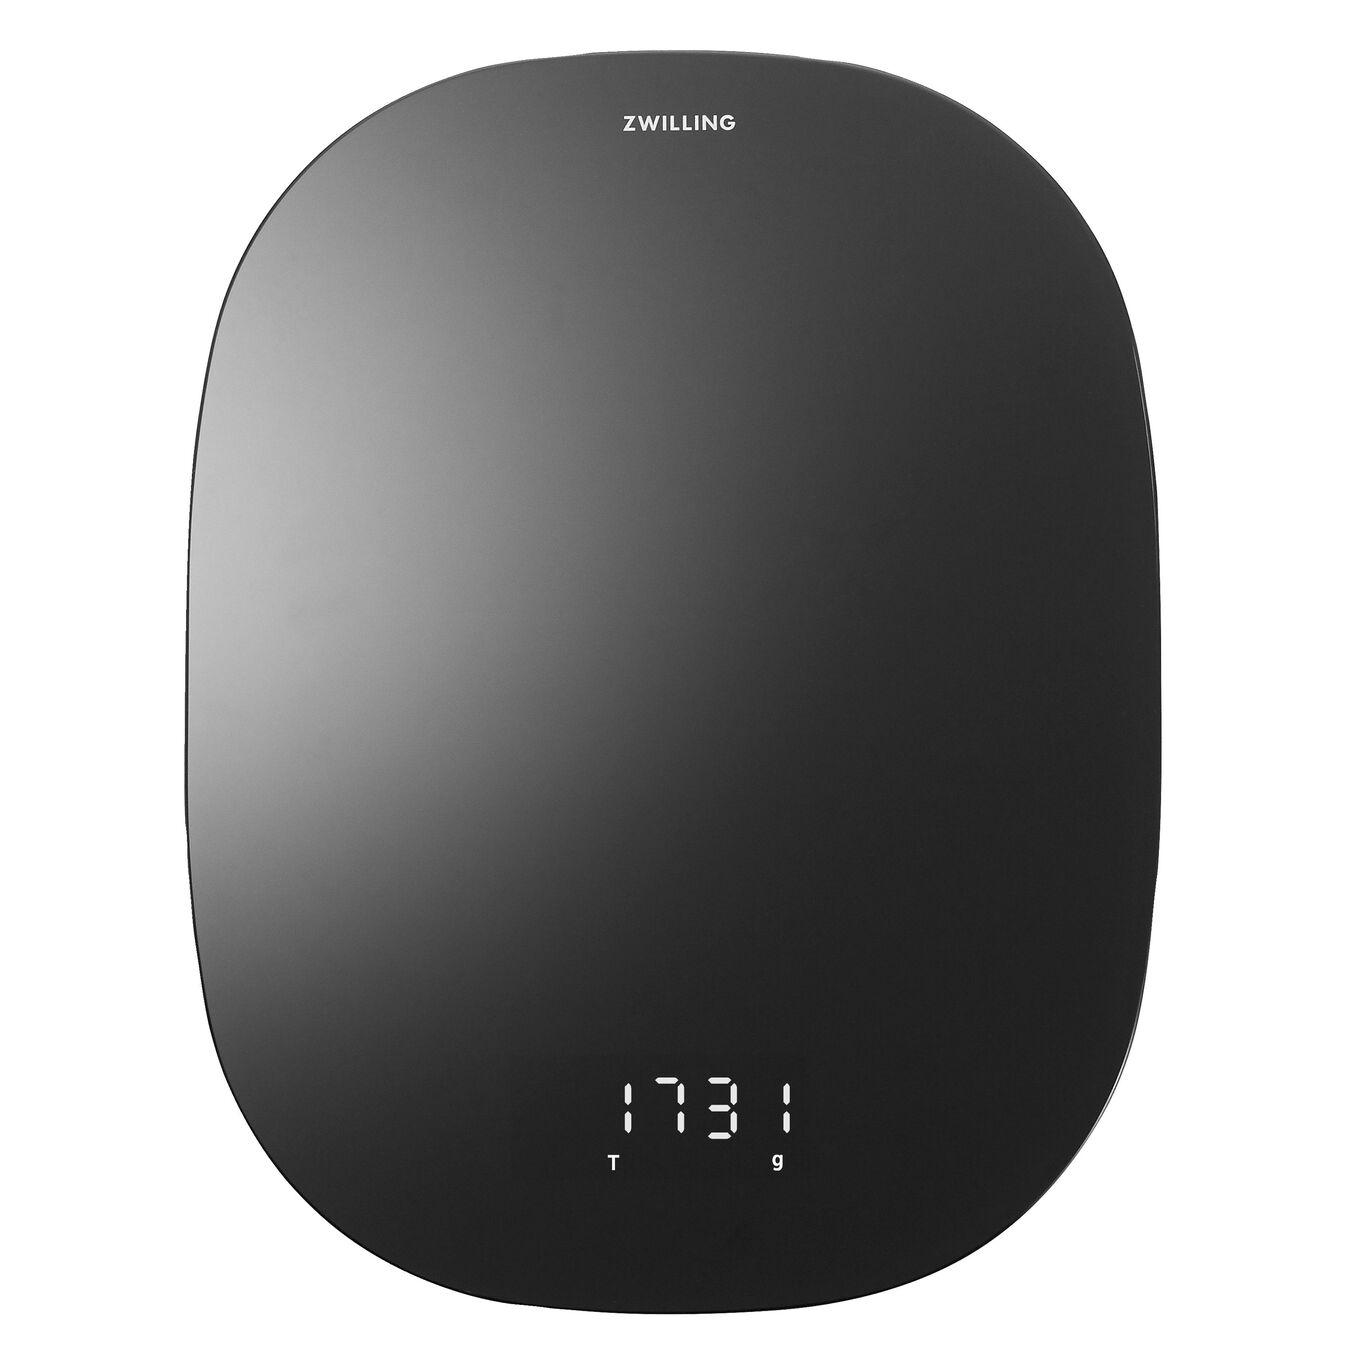 Digital Kitchen Scale - Black,,large 3